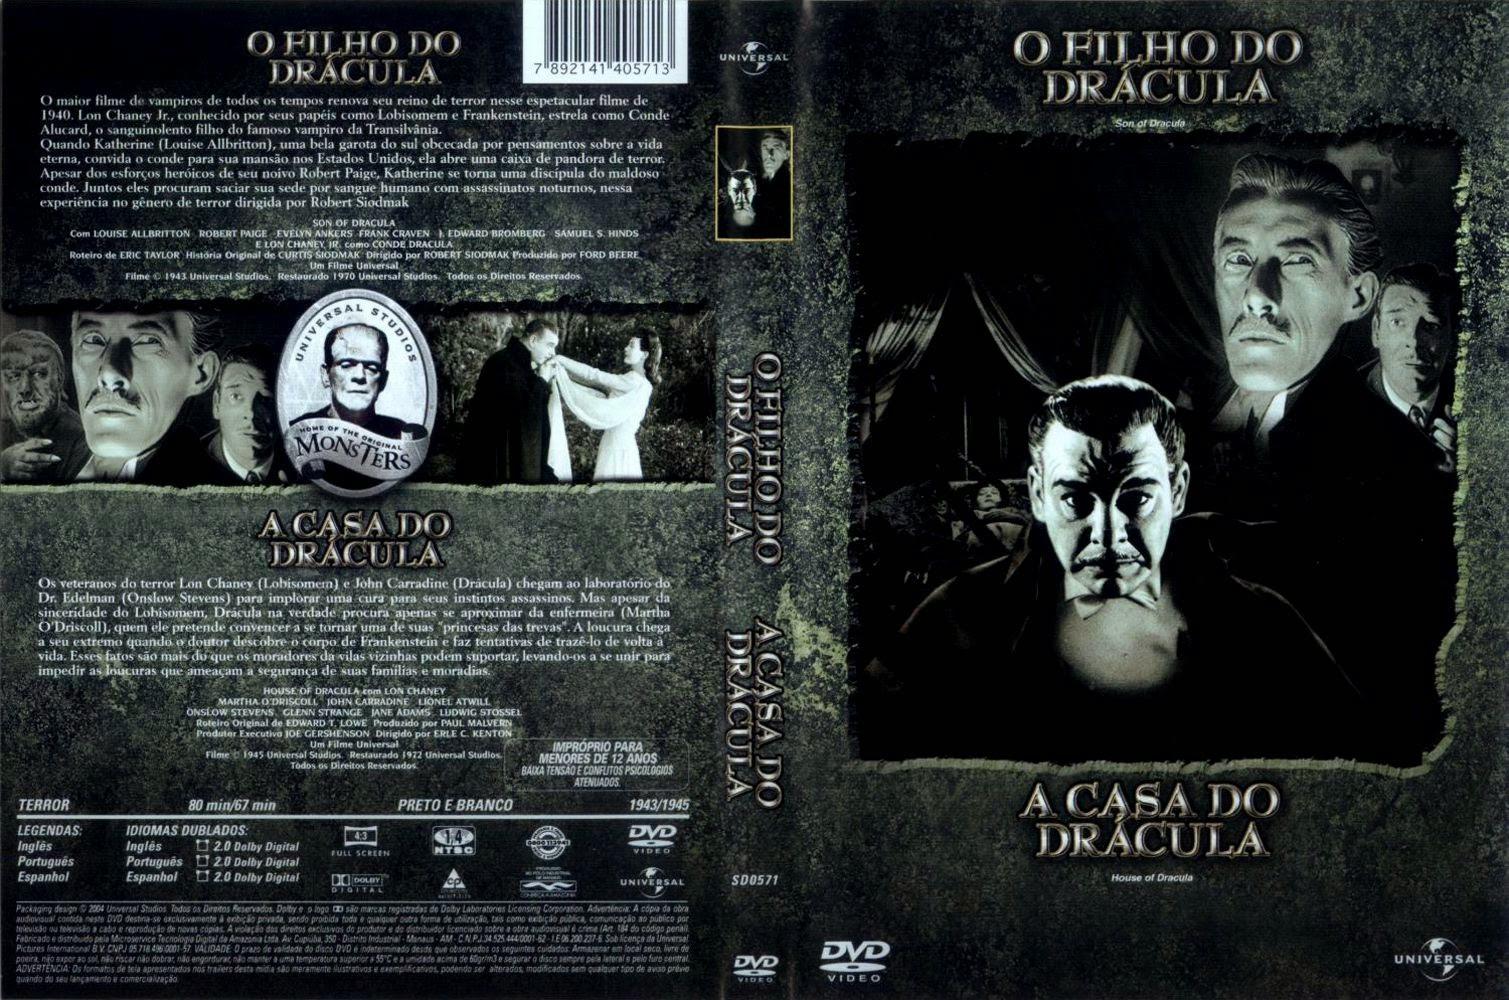 Capa DVD O Filho Do Drácula / A Casa Do Drácula